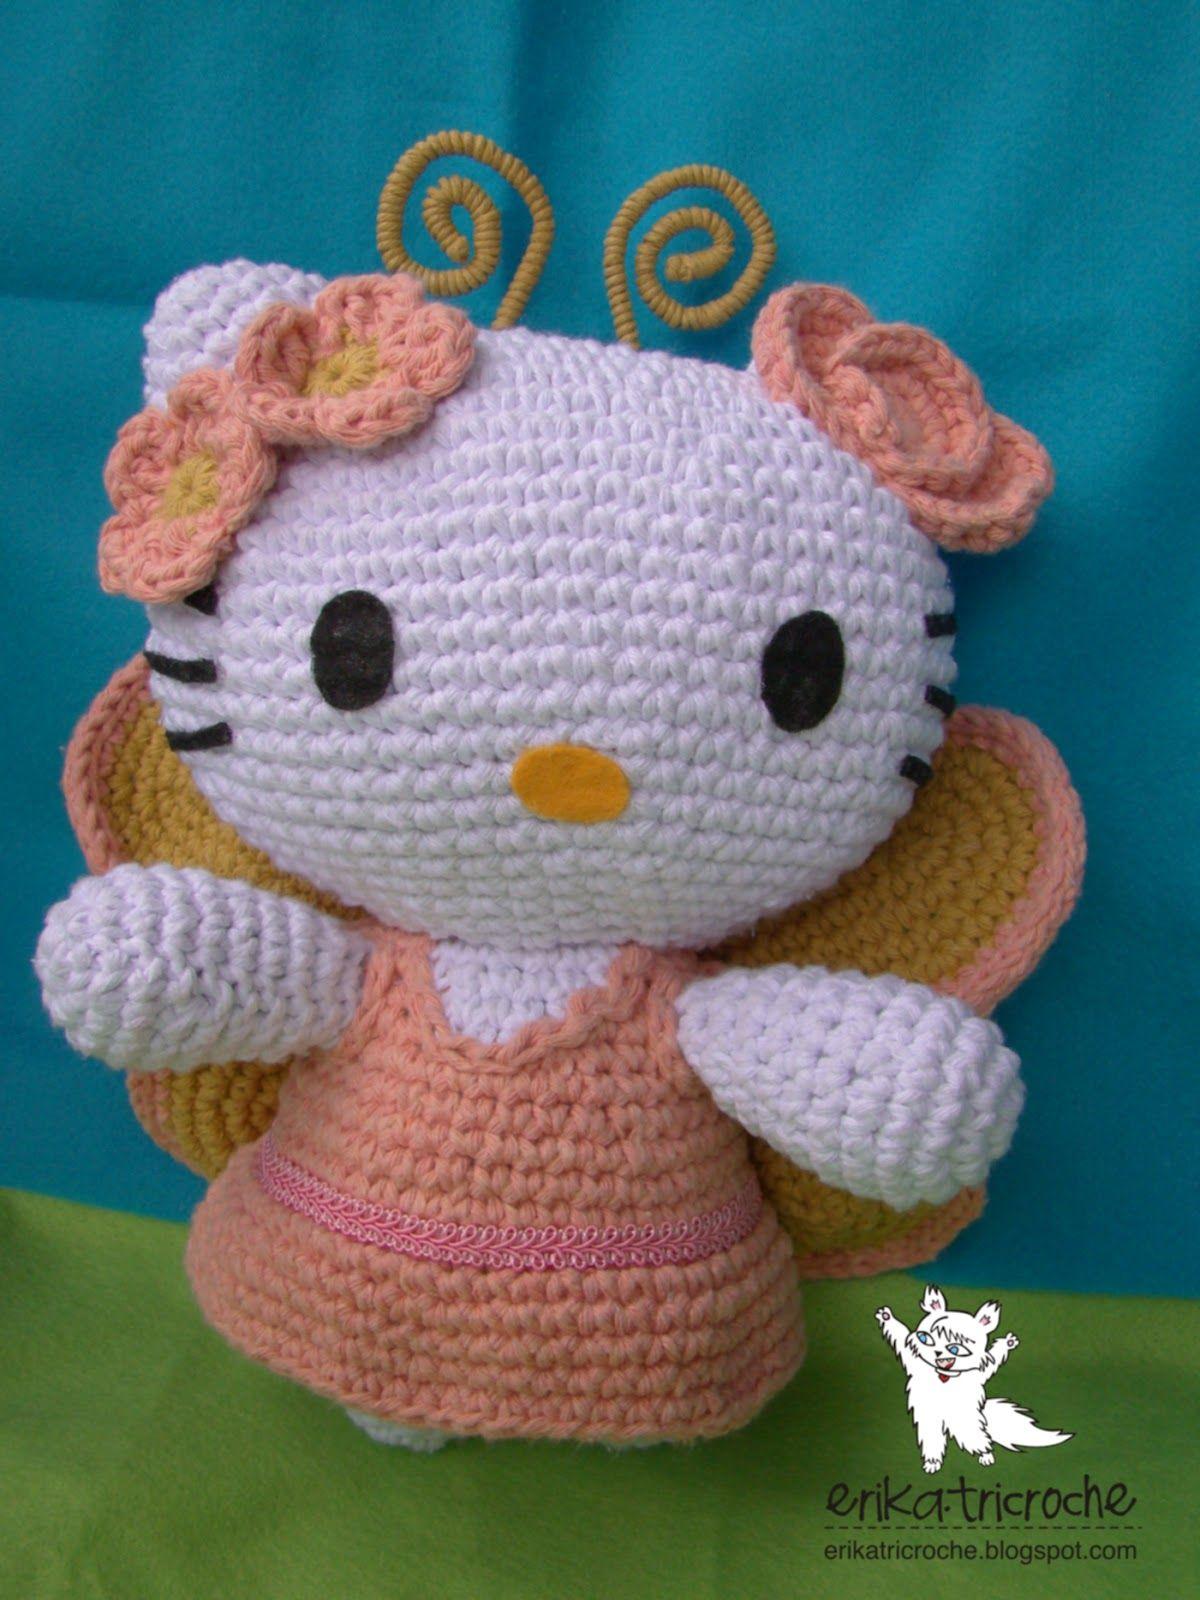 erika.tricroche: Hello kitty butterfly | Crochet Inspiration (Items ...